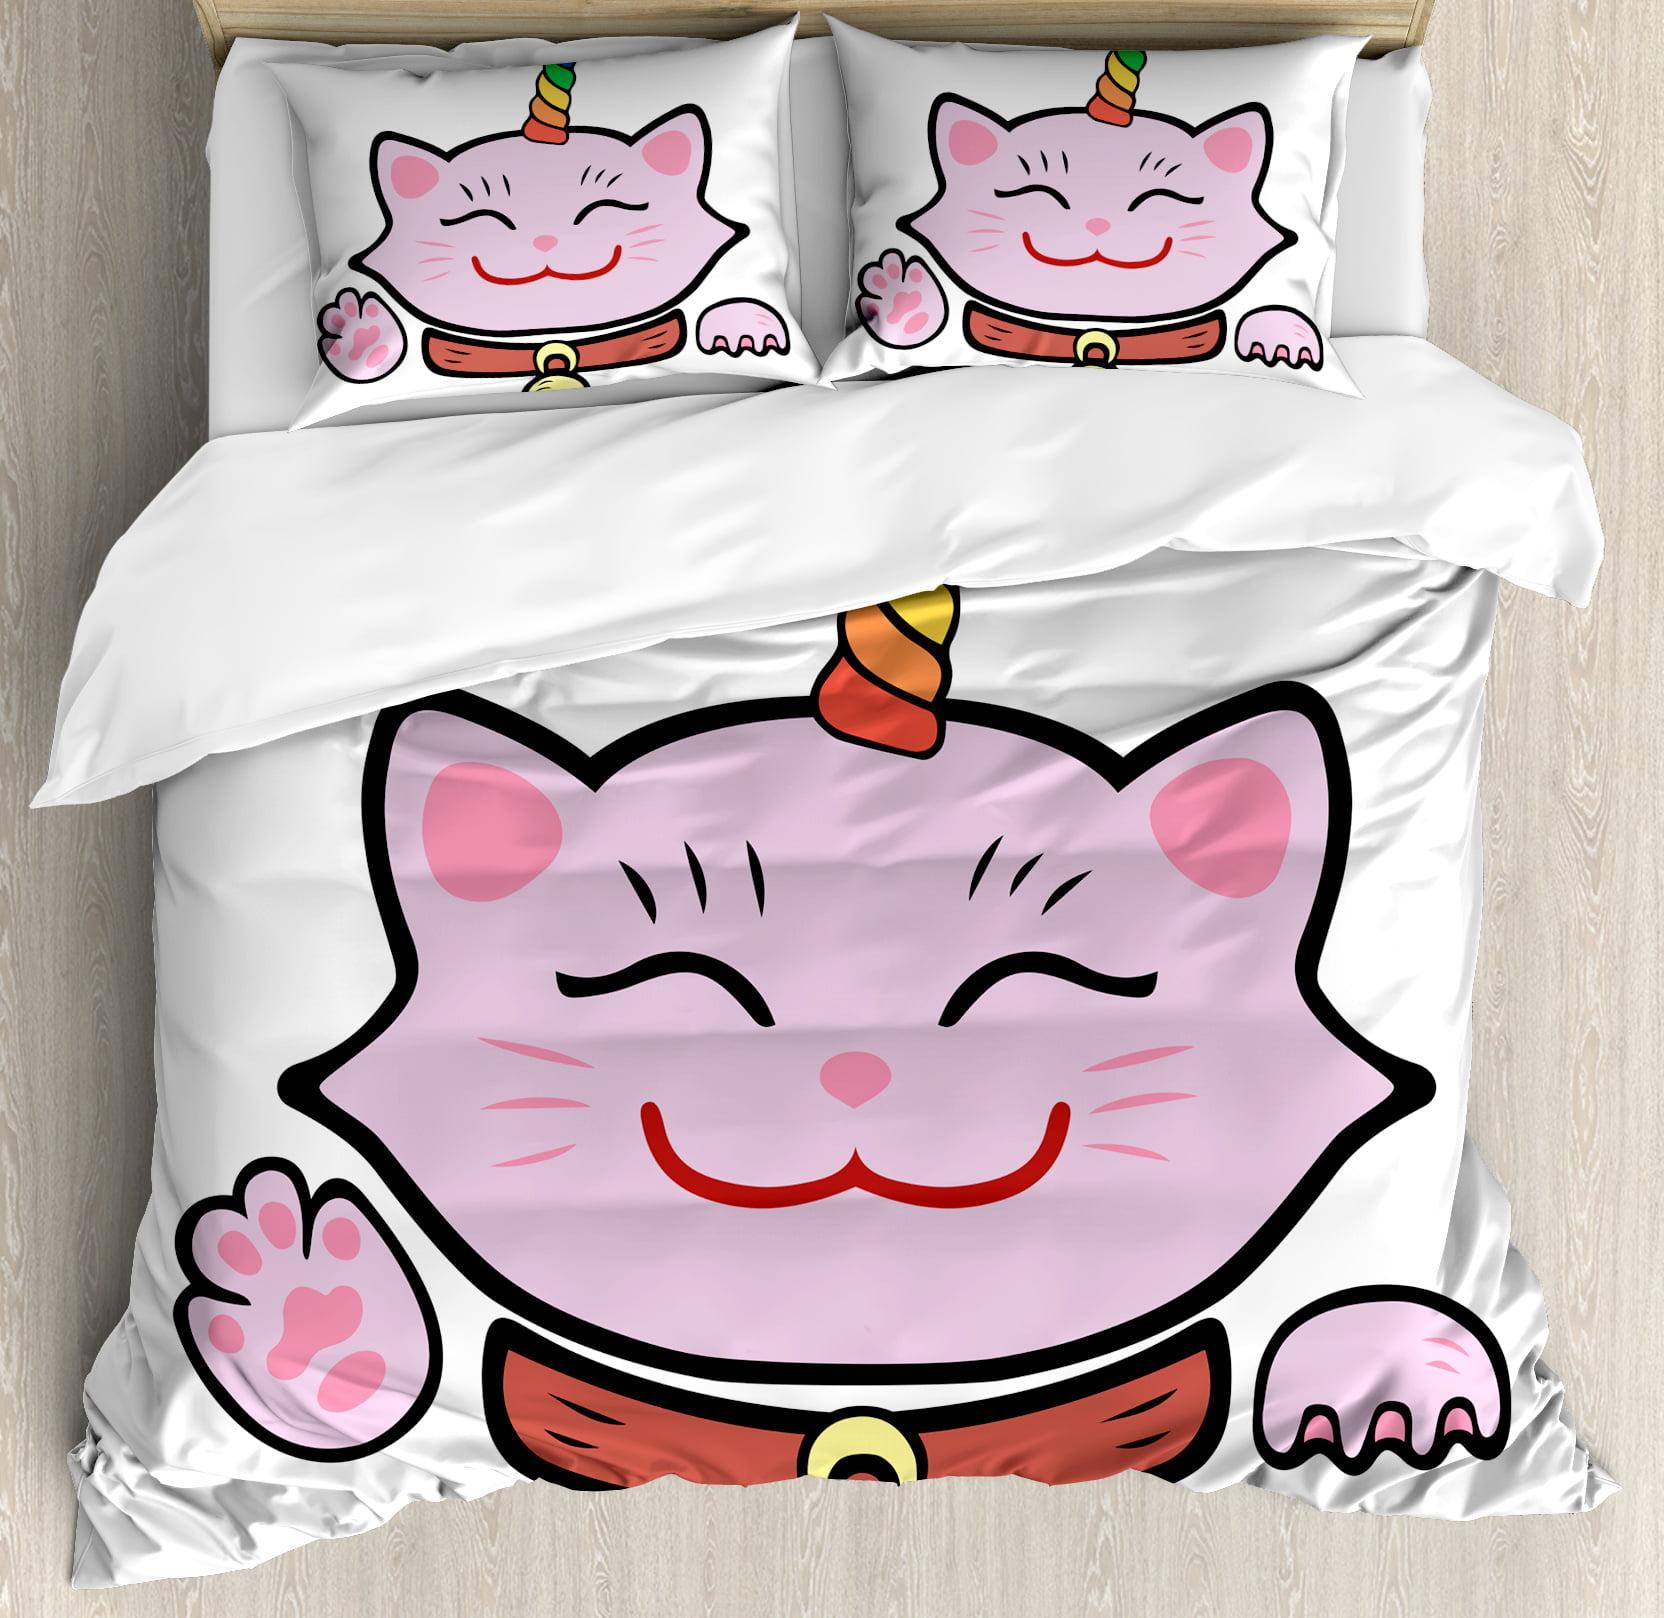 Unicorn Cat King Size Duvet Cover Set, Pink Maneki Neko S...